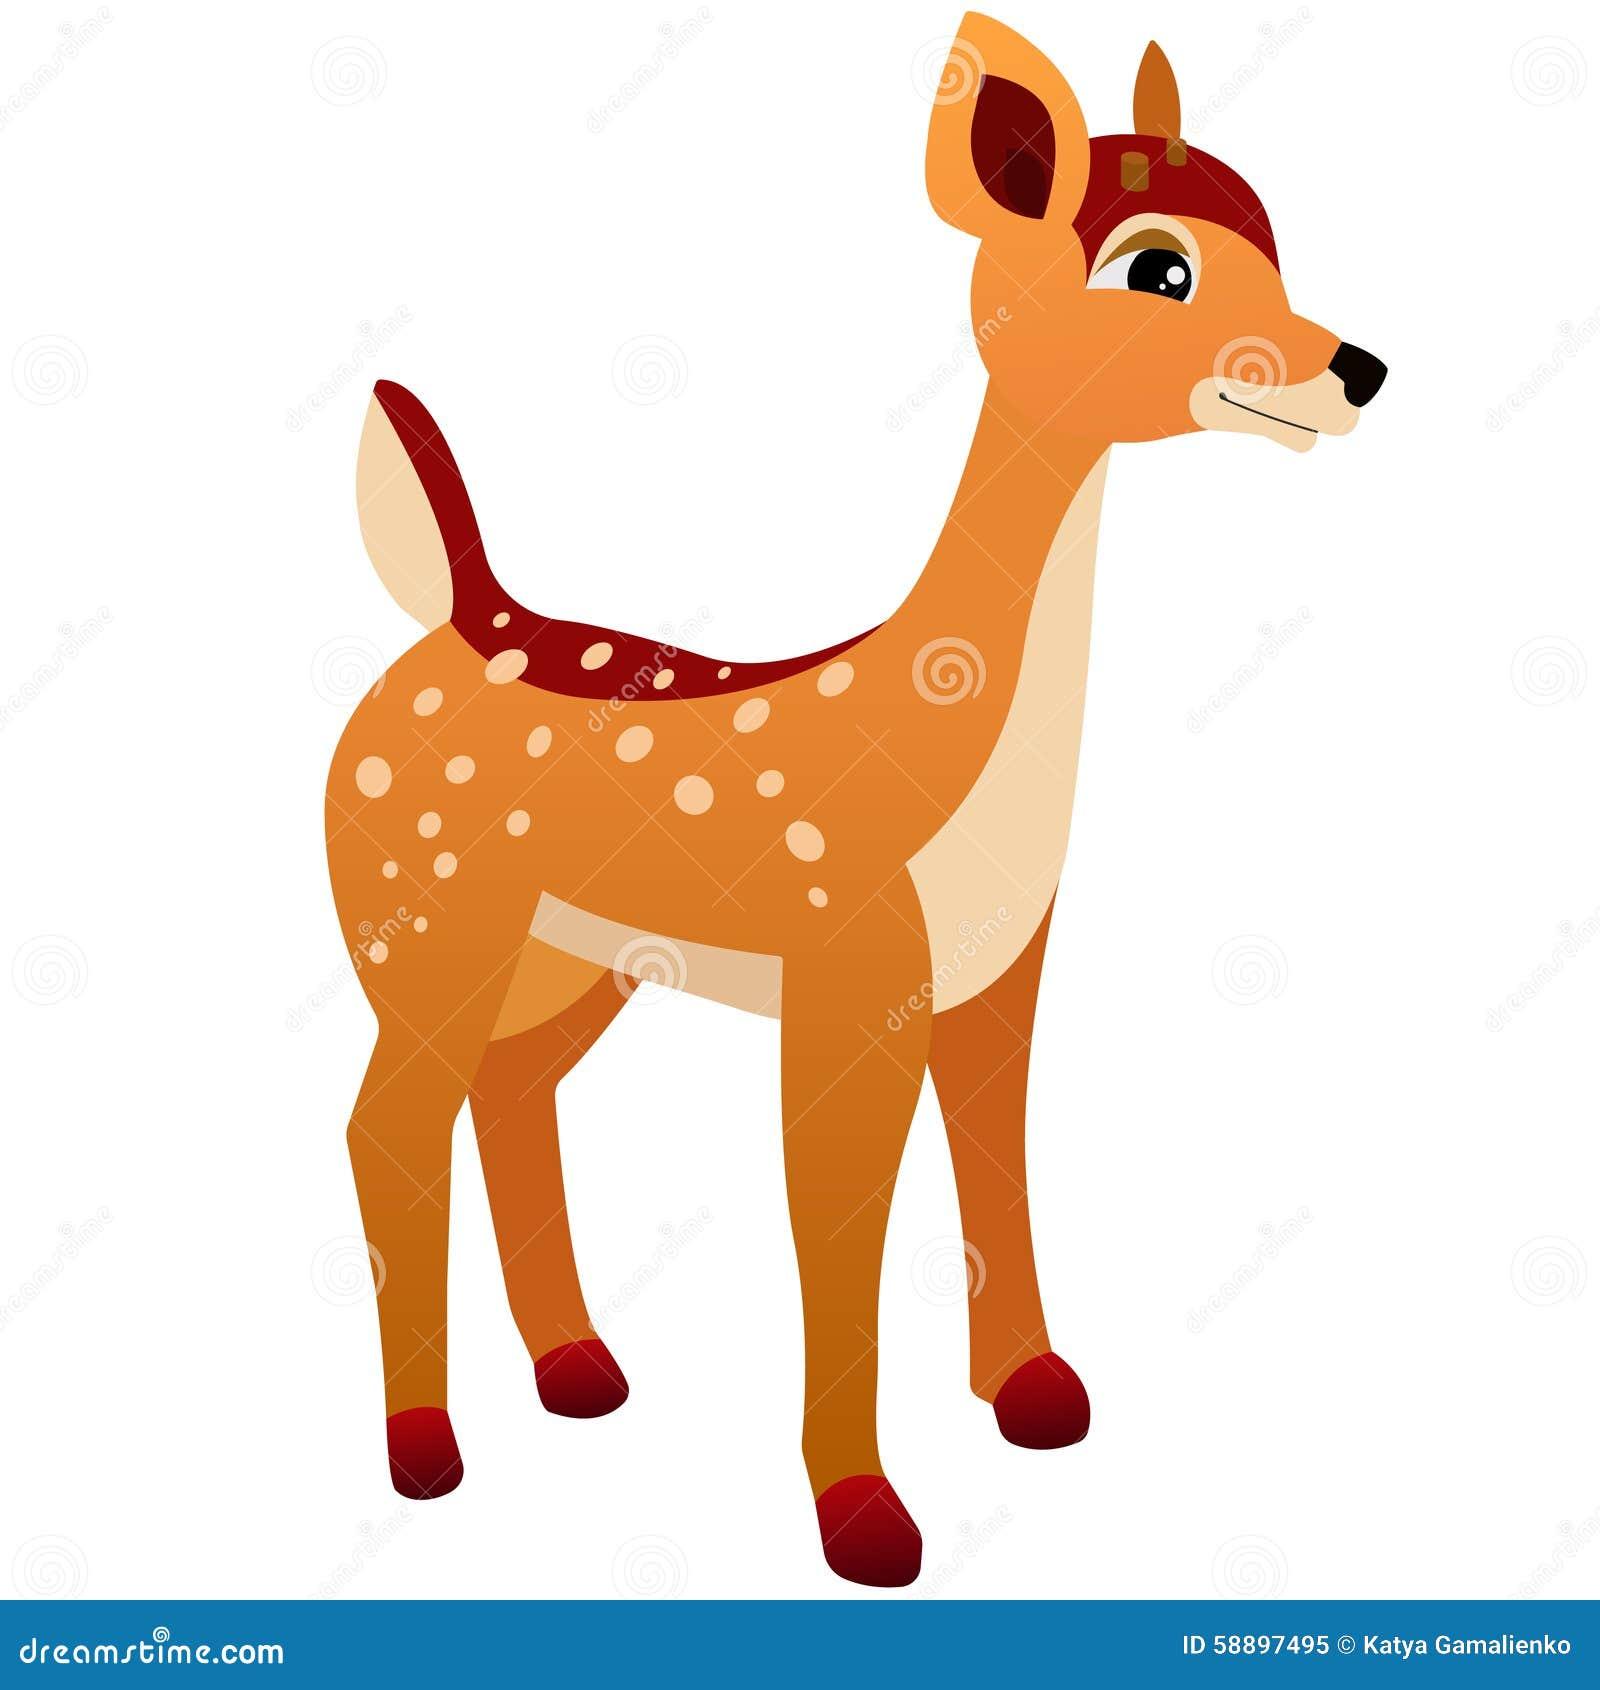 Deer Cartoon Stock Illustration Image 58897495